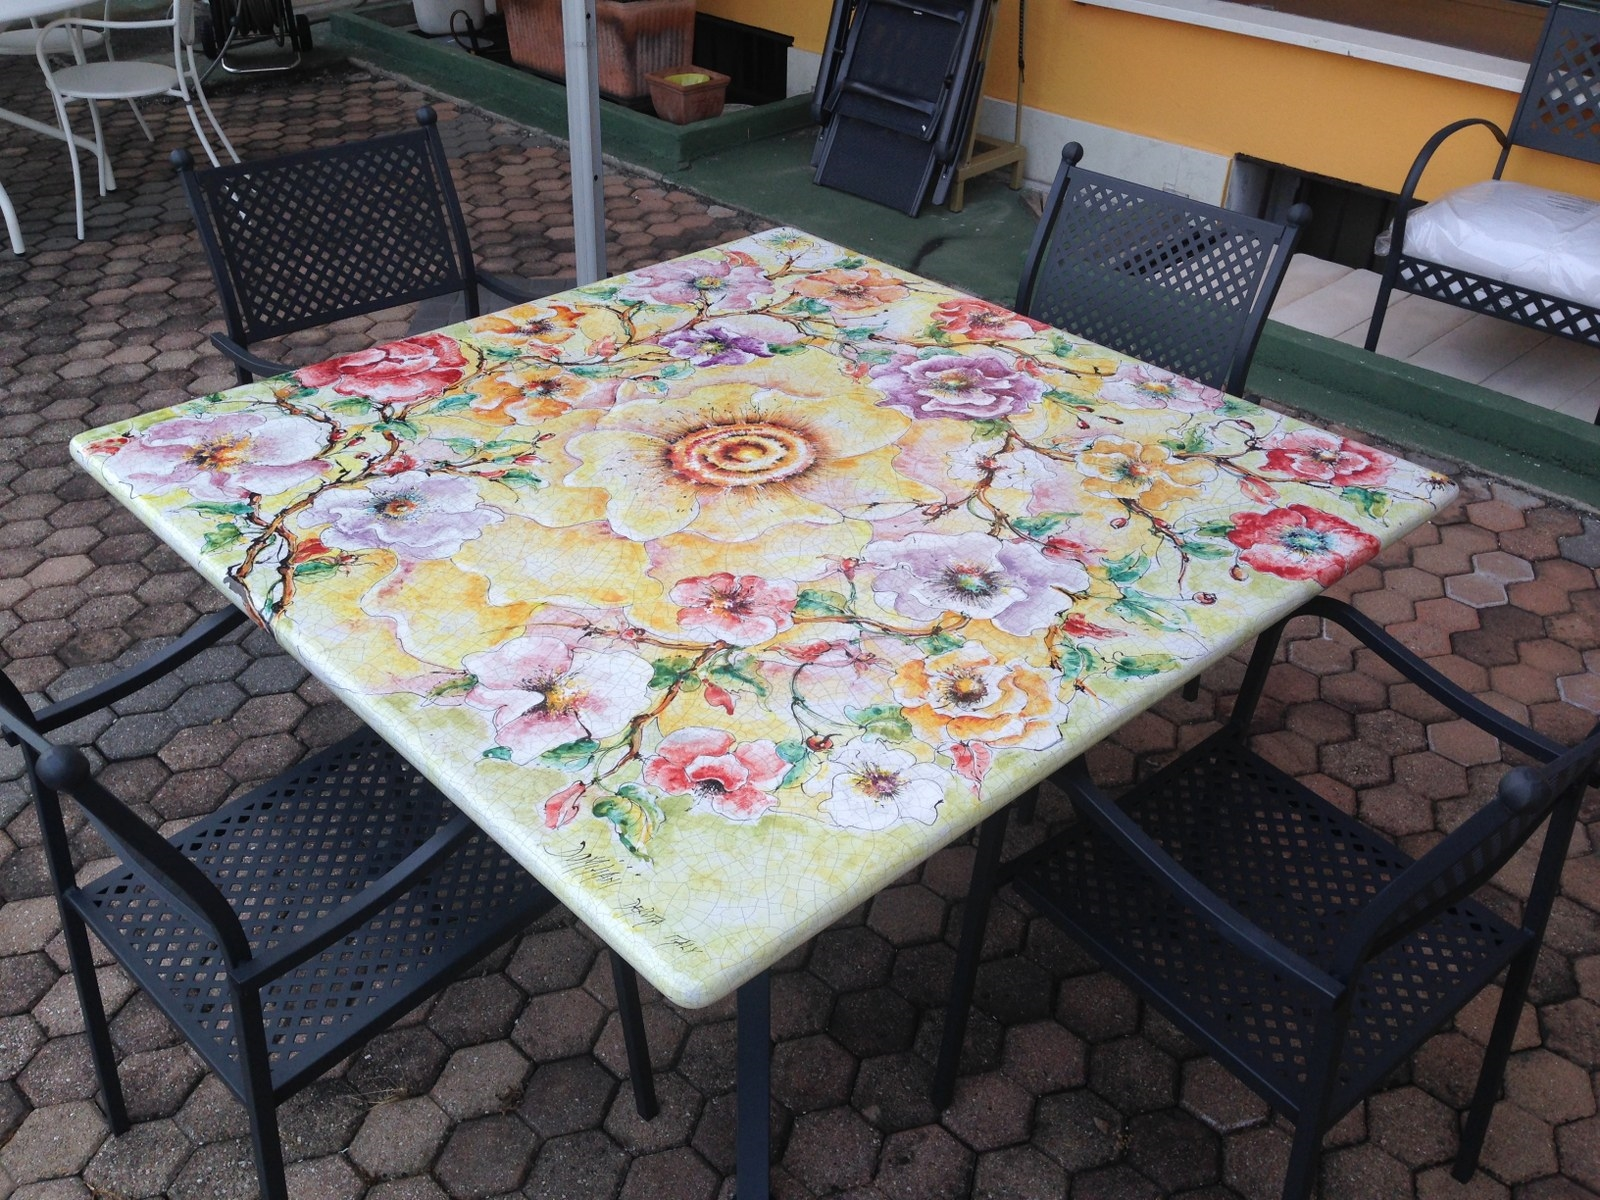 Arredo giardino Verona: Offerte Online a Prezzi Scontati